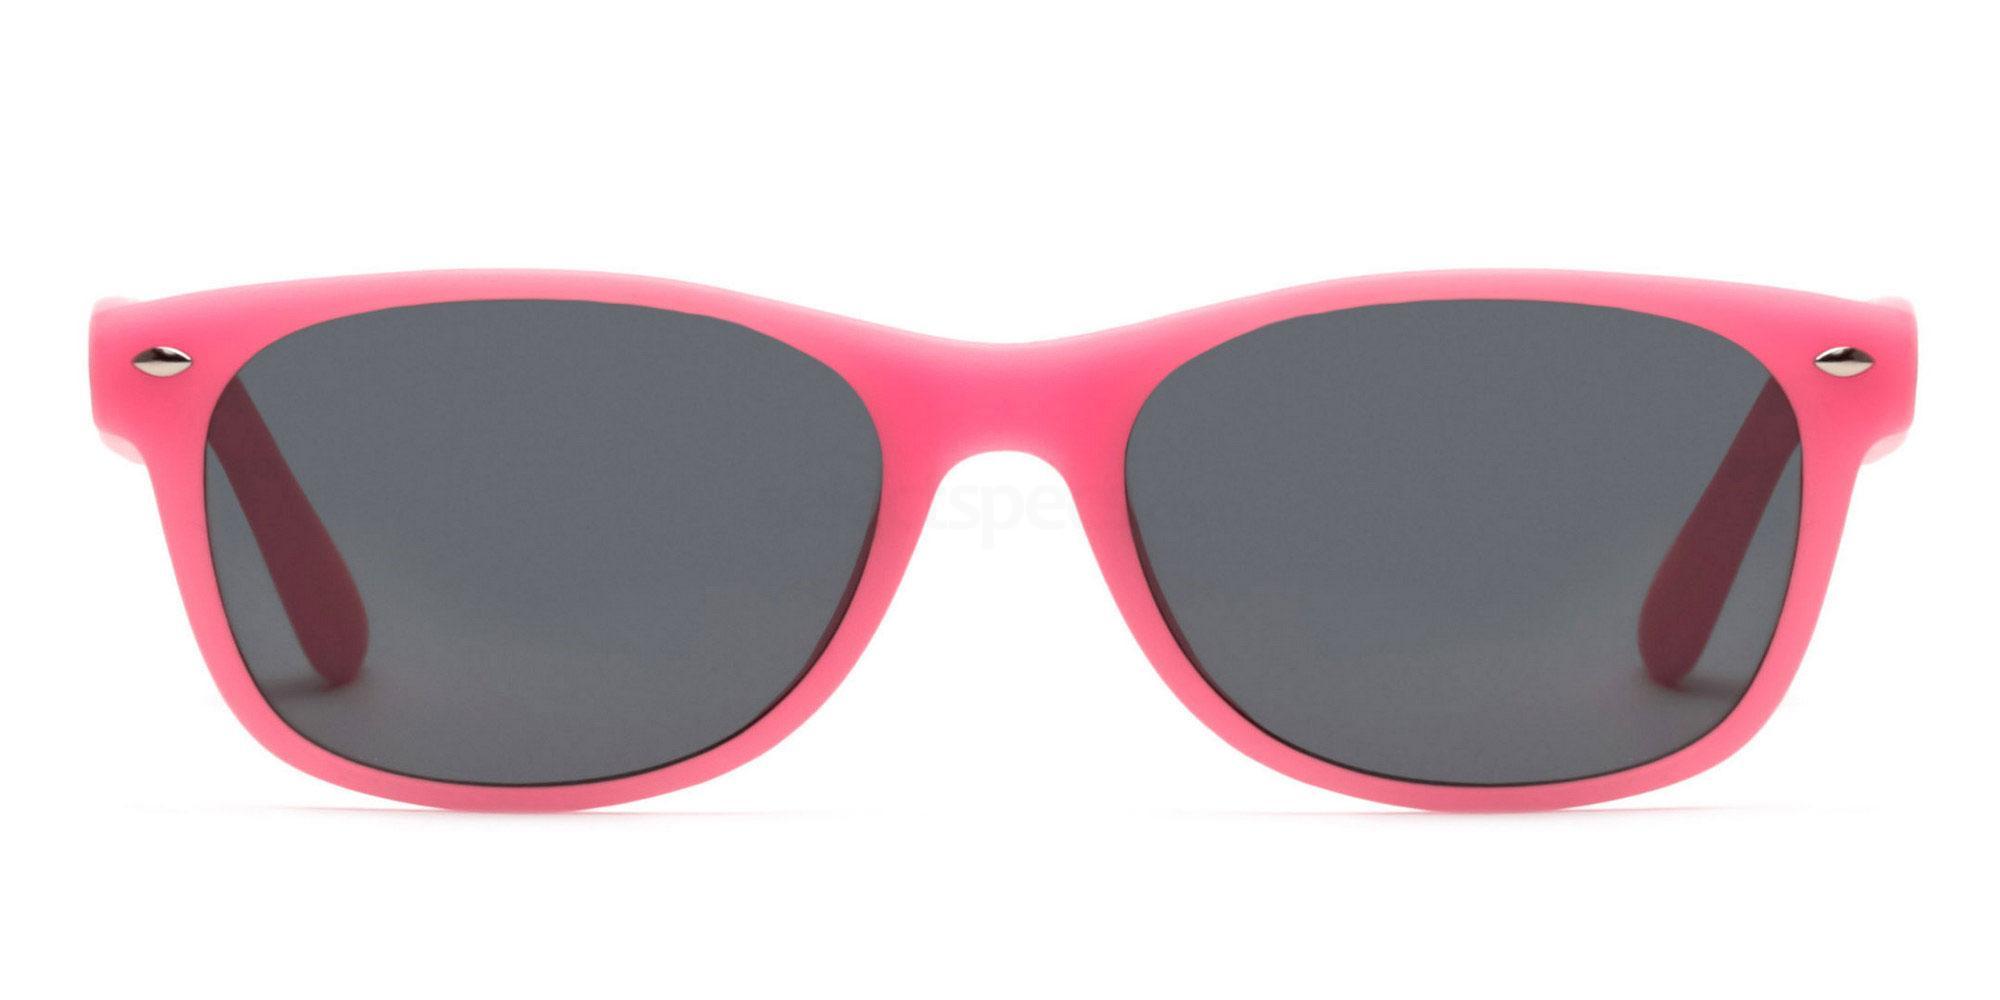 61ff50d0d8 Savannah S8122 - Pink (Sunglasses) sunglasses